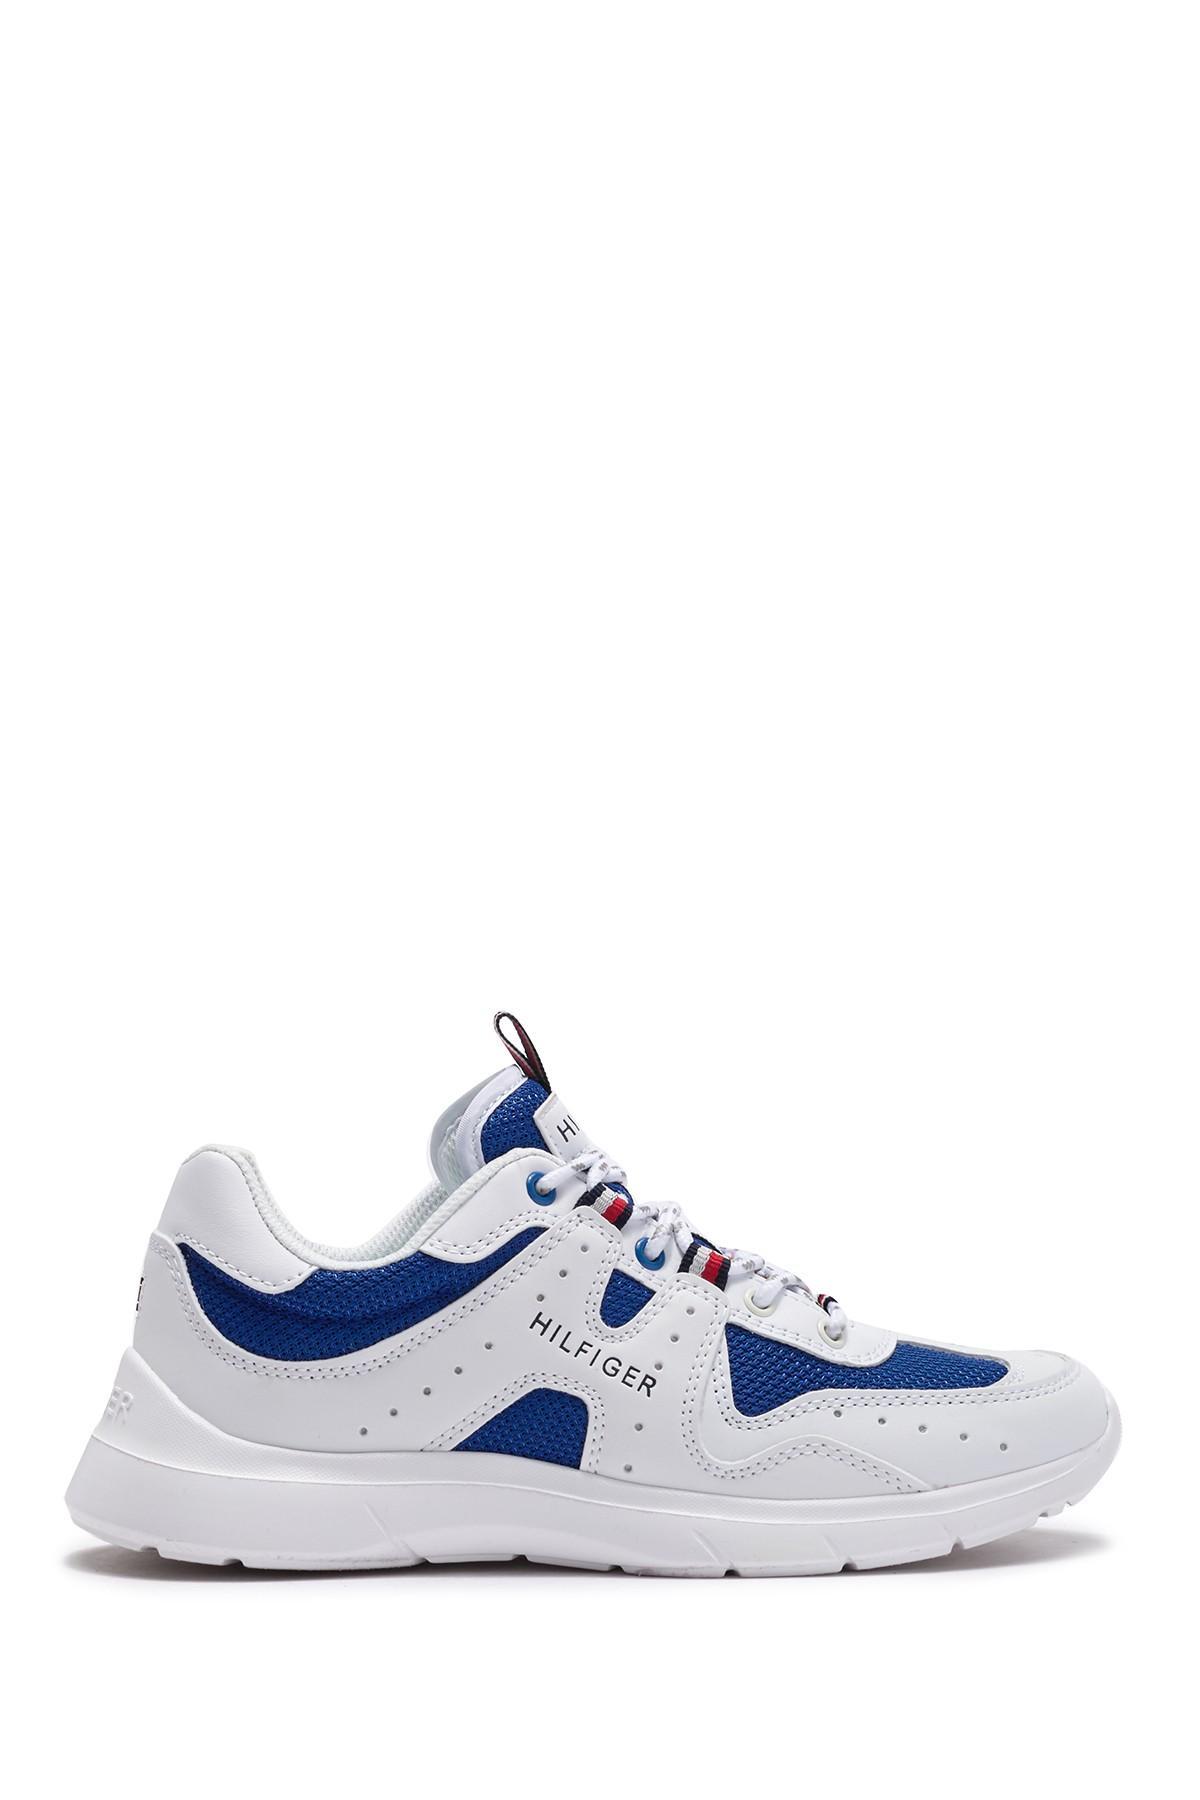 Tommy Hilfiger Corio Sneaker in White